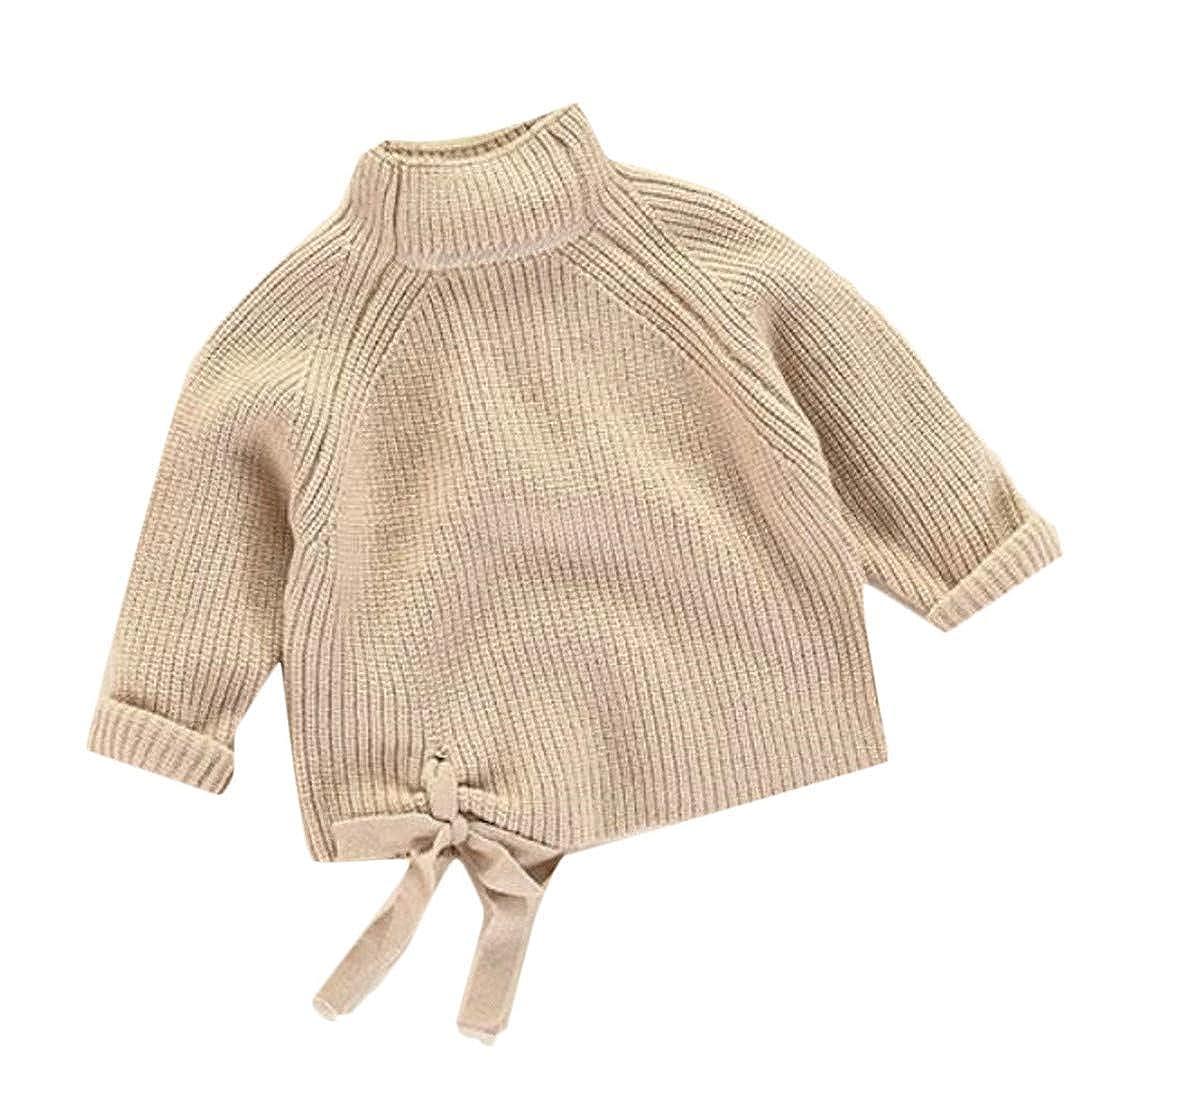 Joe Wenko Girls Bow Mock Turtle Neck Trendy Solid Knits Pullover Jumper Sweaters